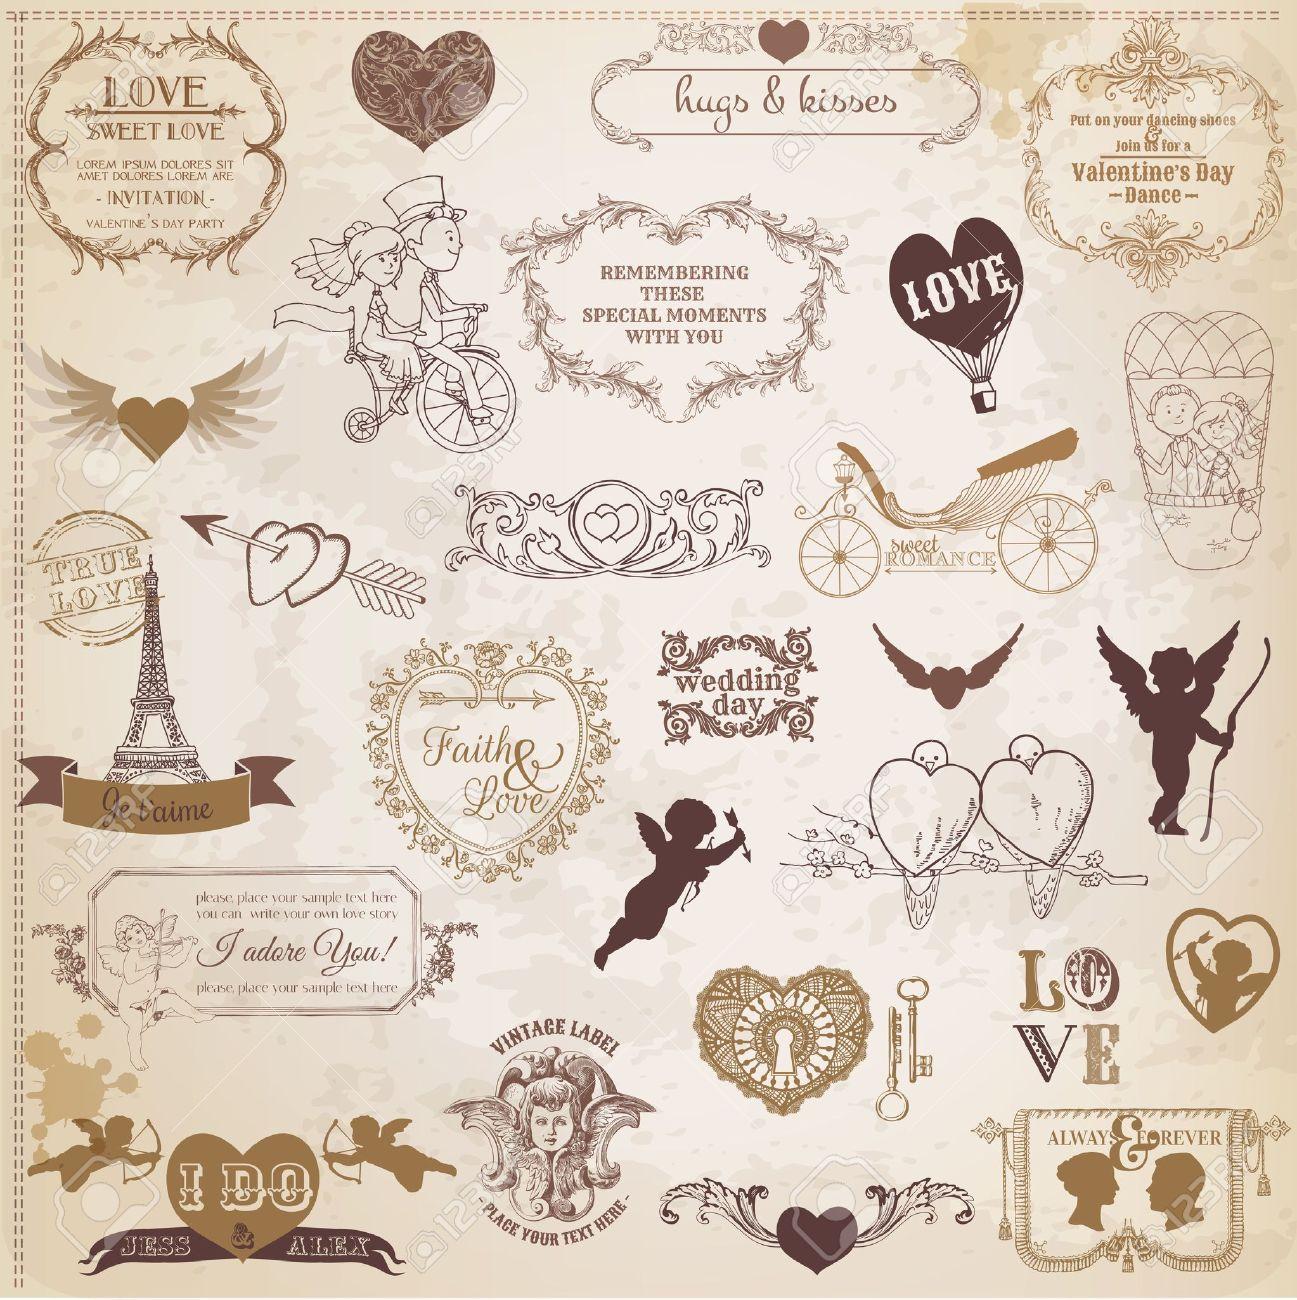 How to scrapbook a wedding invitation - Vector Scrapbook Love Valentine Wedding Vintage Scrap Scrapbooking Invitation Calligraphy Heart Cupid Angel Frame Bird Design Element